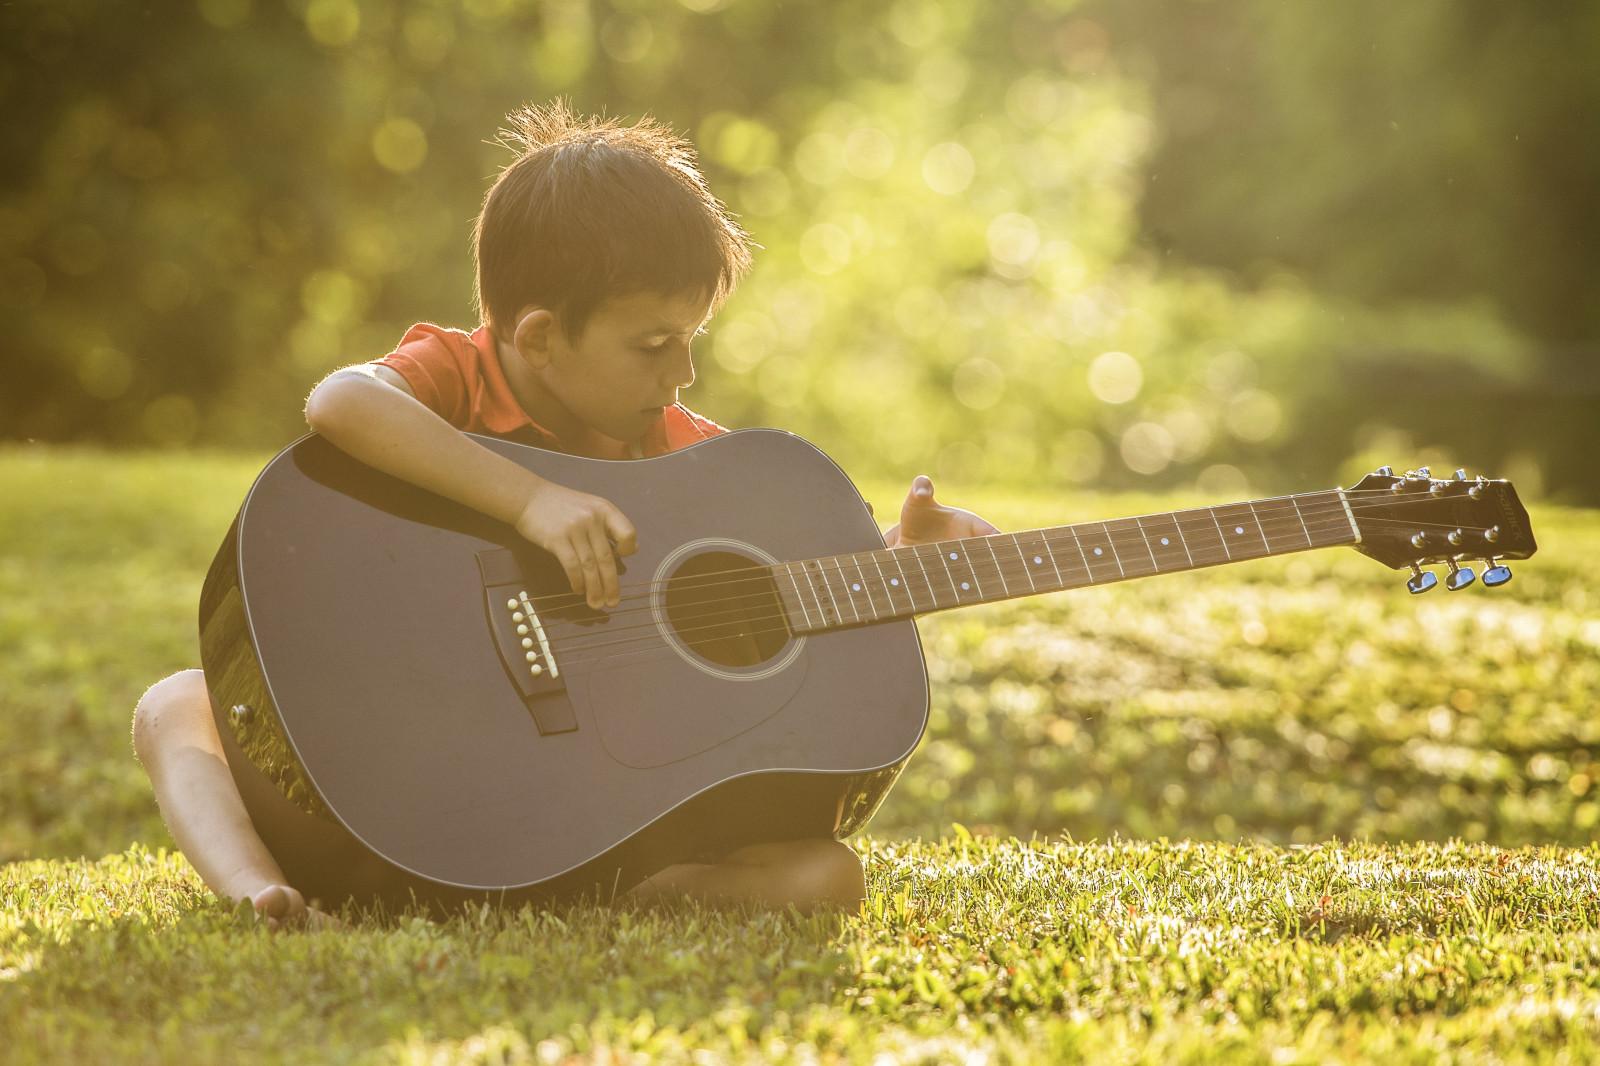 Wallpaper Sunlight Portrait Nature Grass Musical Instrument Yellow Nikon Bokeh Warm Family Play Light Tree 70200 Boy Child Kids Plant